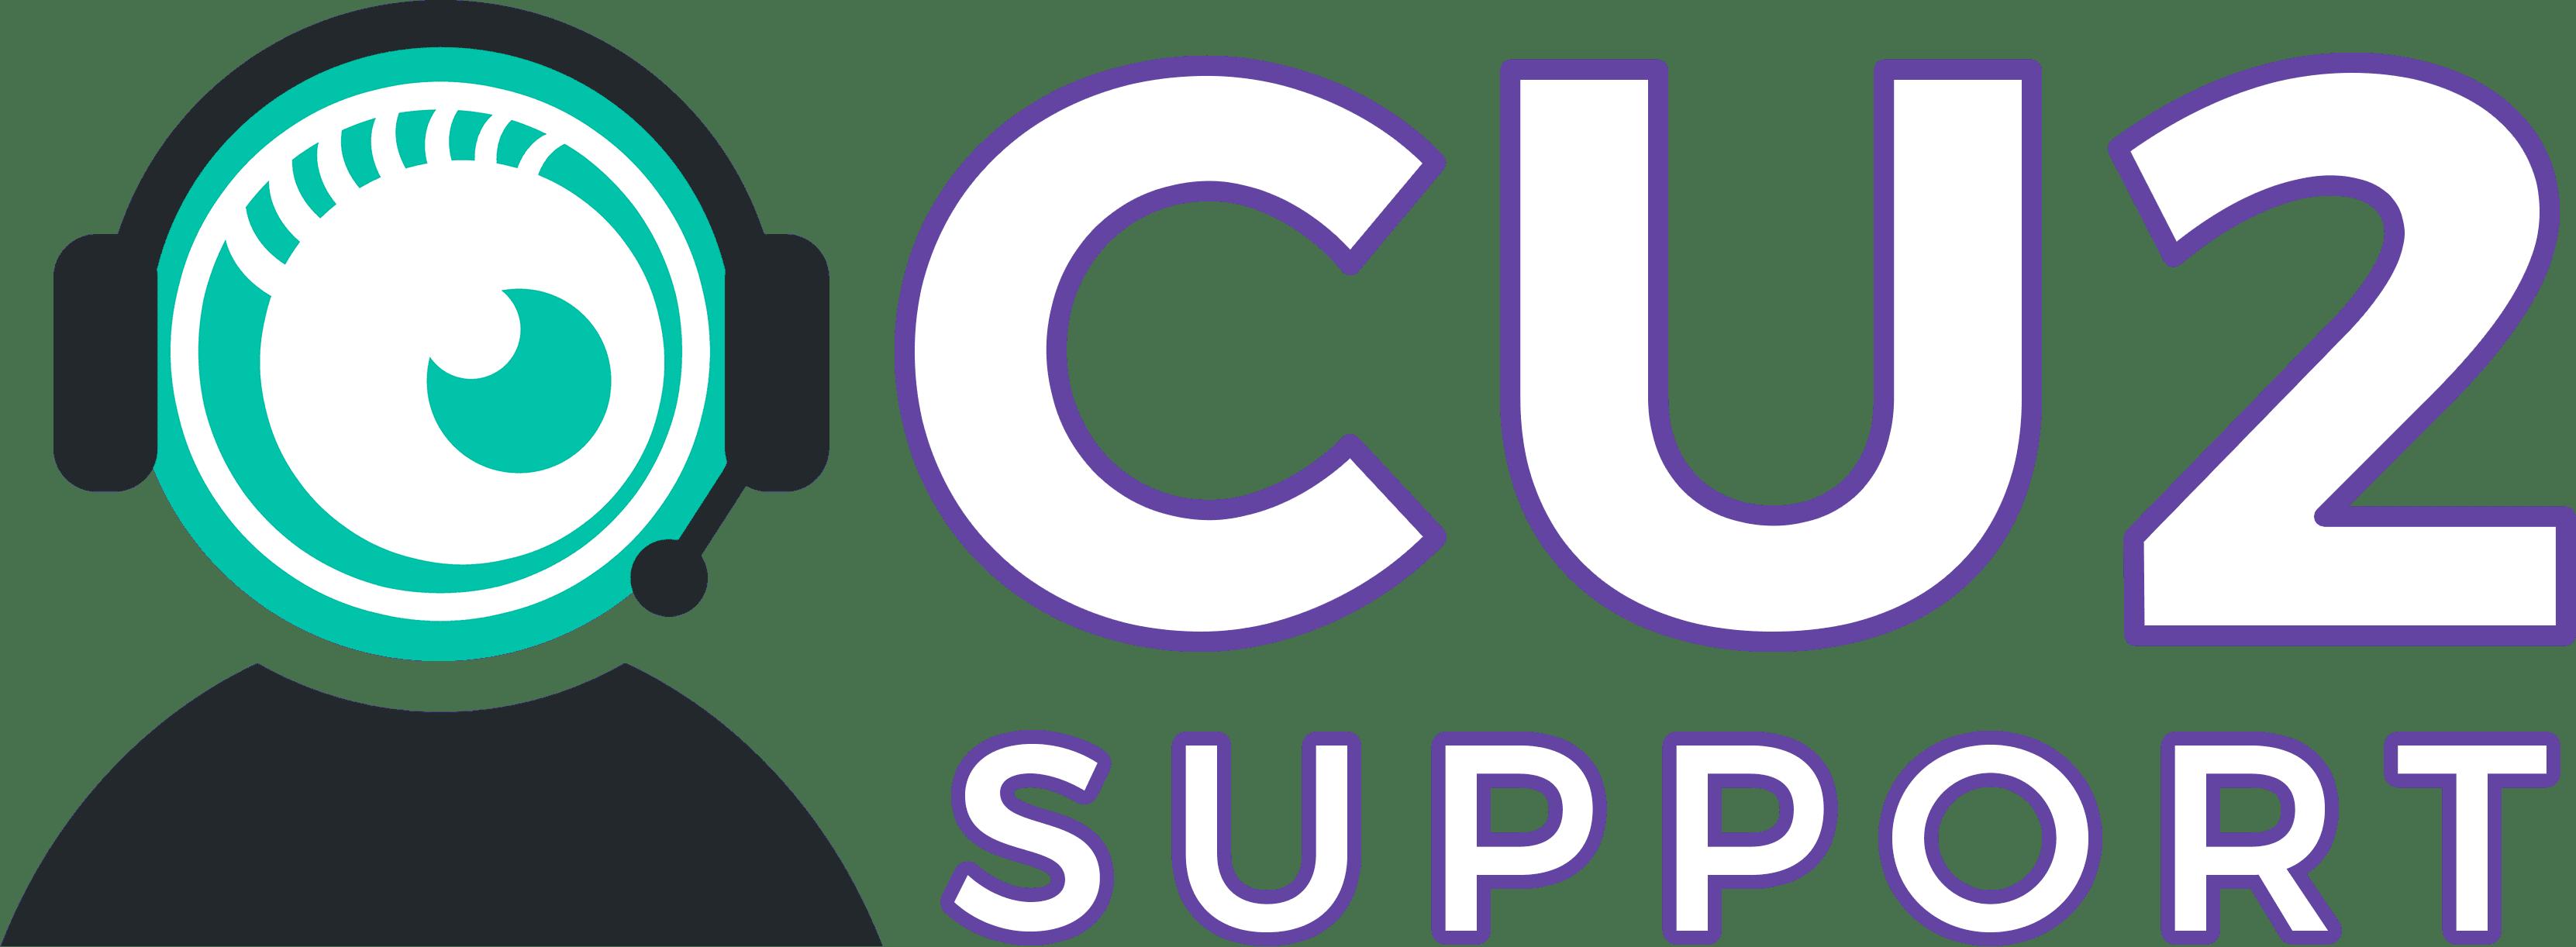 CU2 Resources